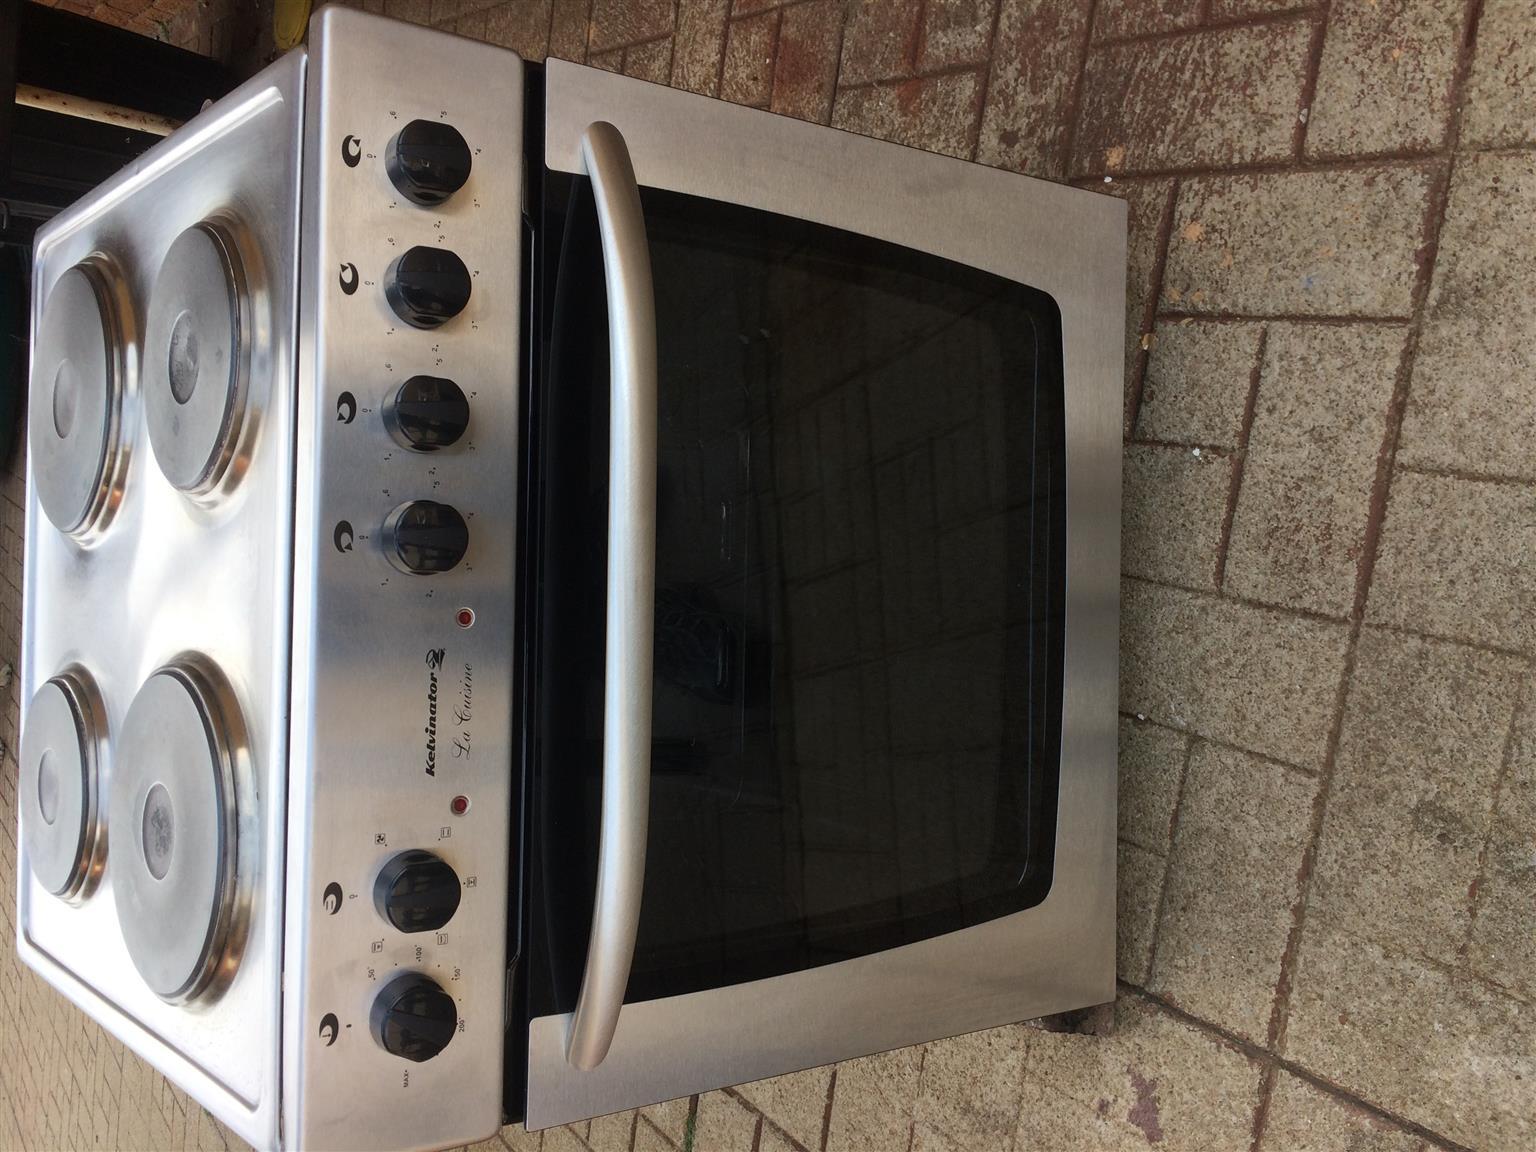 Kelvinator La-Cuisine Stove top and oven